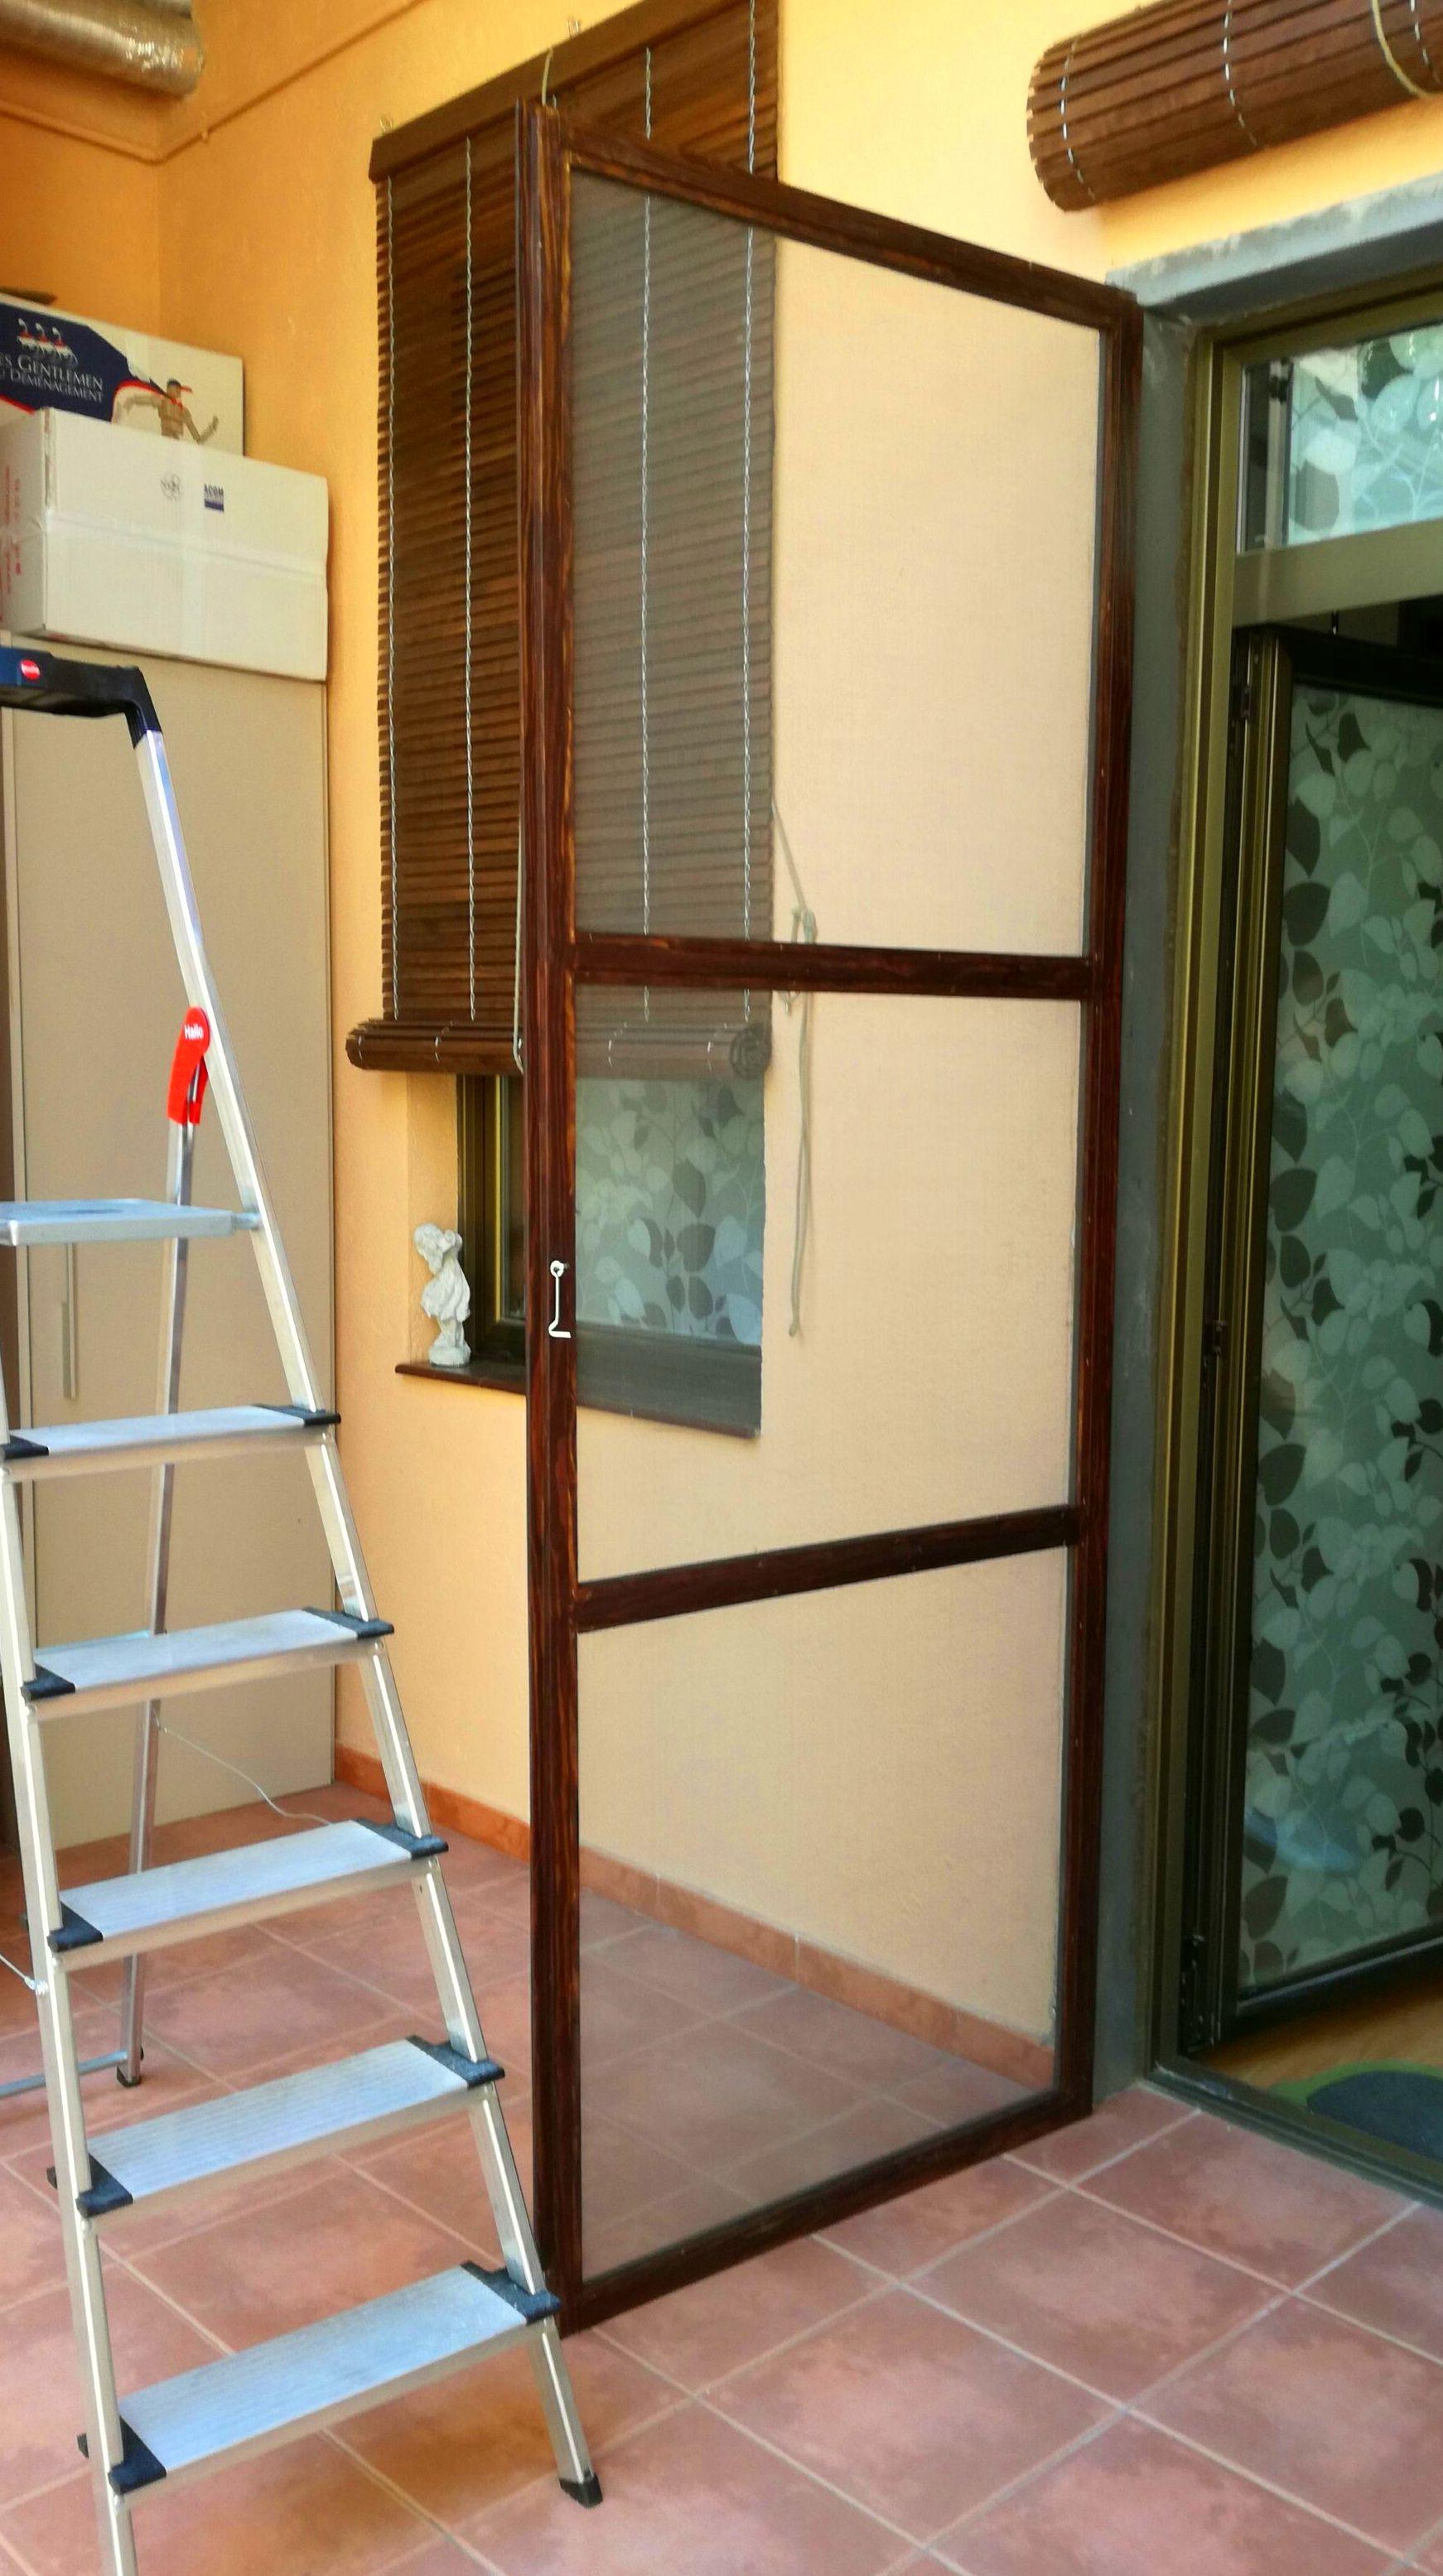 Puerta mosquitera para terraza en barrio de Gracia - BCN